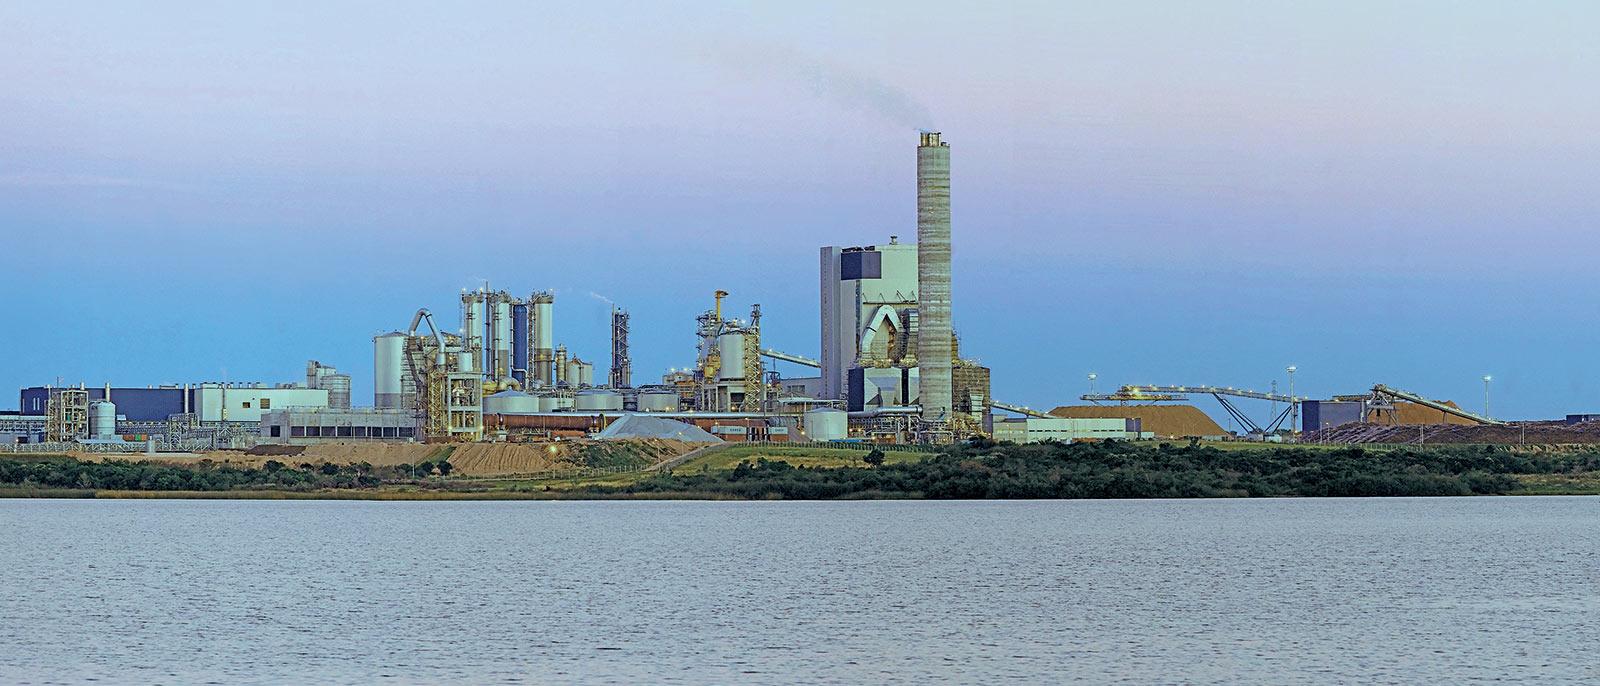 Pulp mill in Fray Bentos, Uruguay.